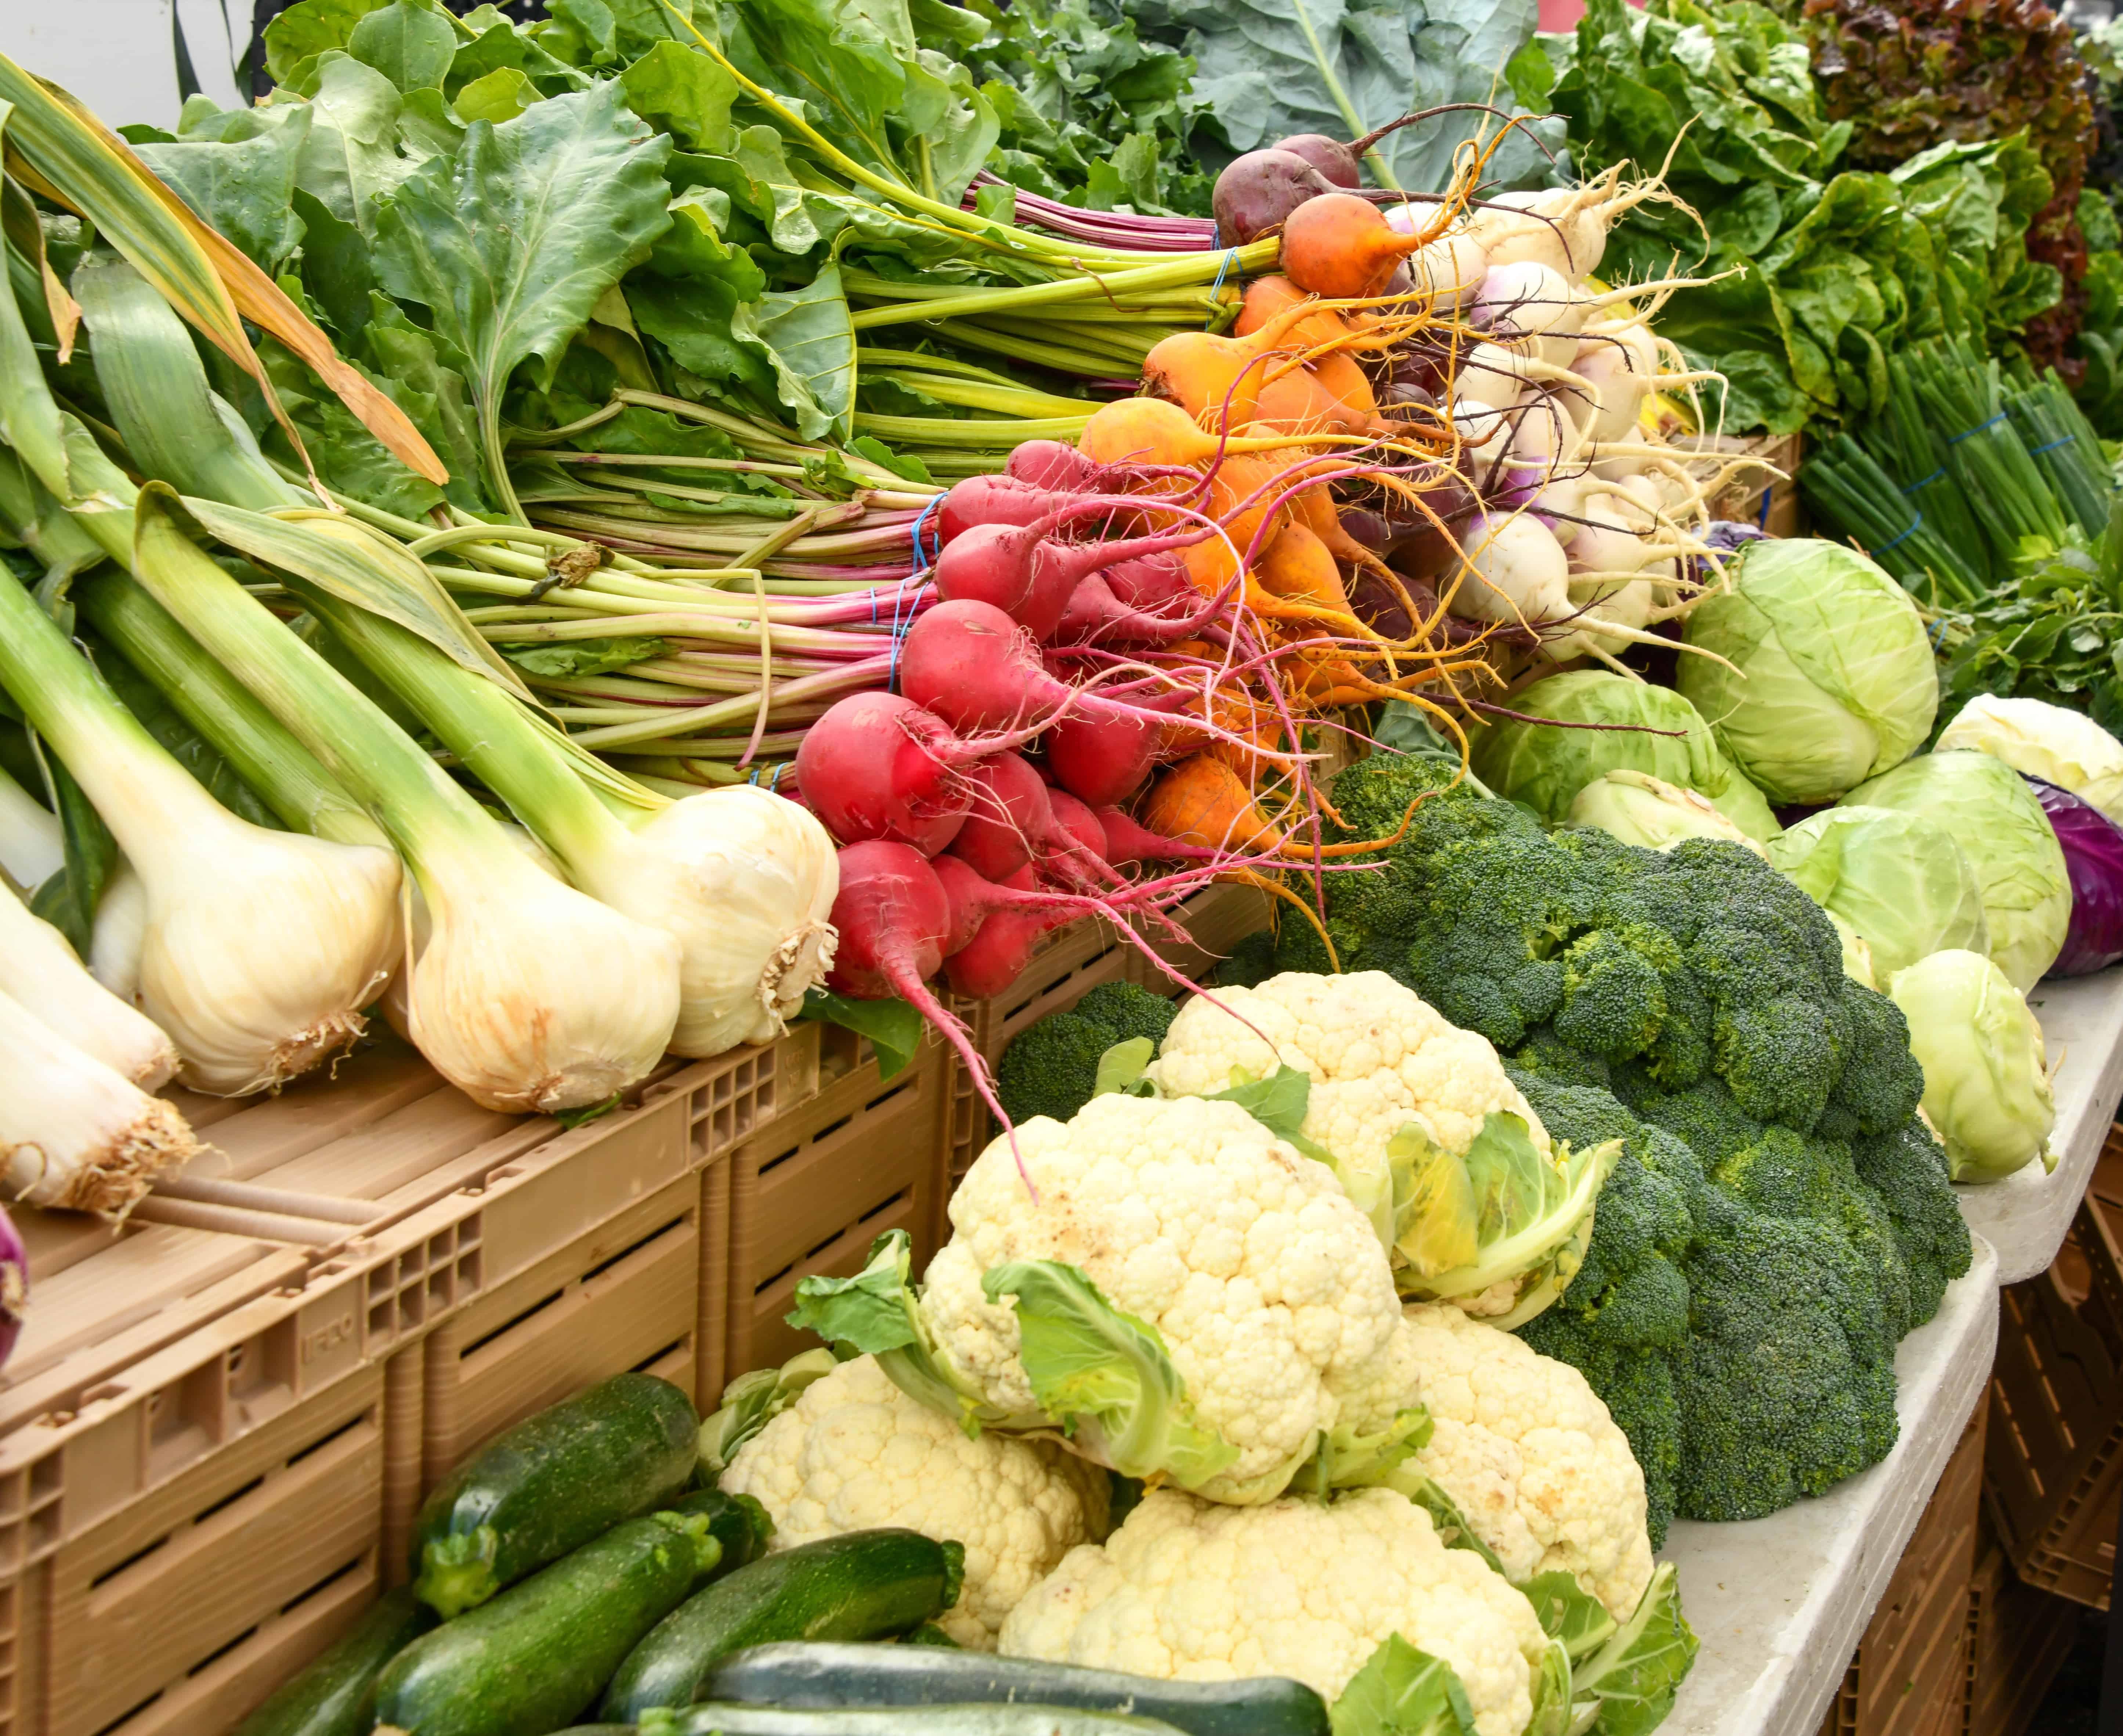 farm to table produce local